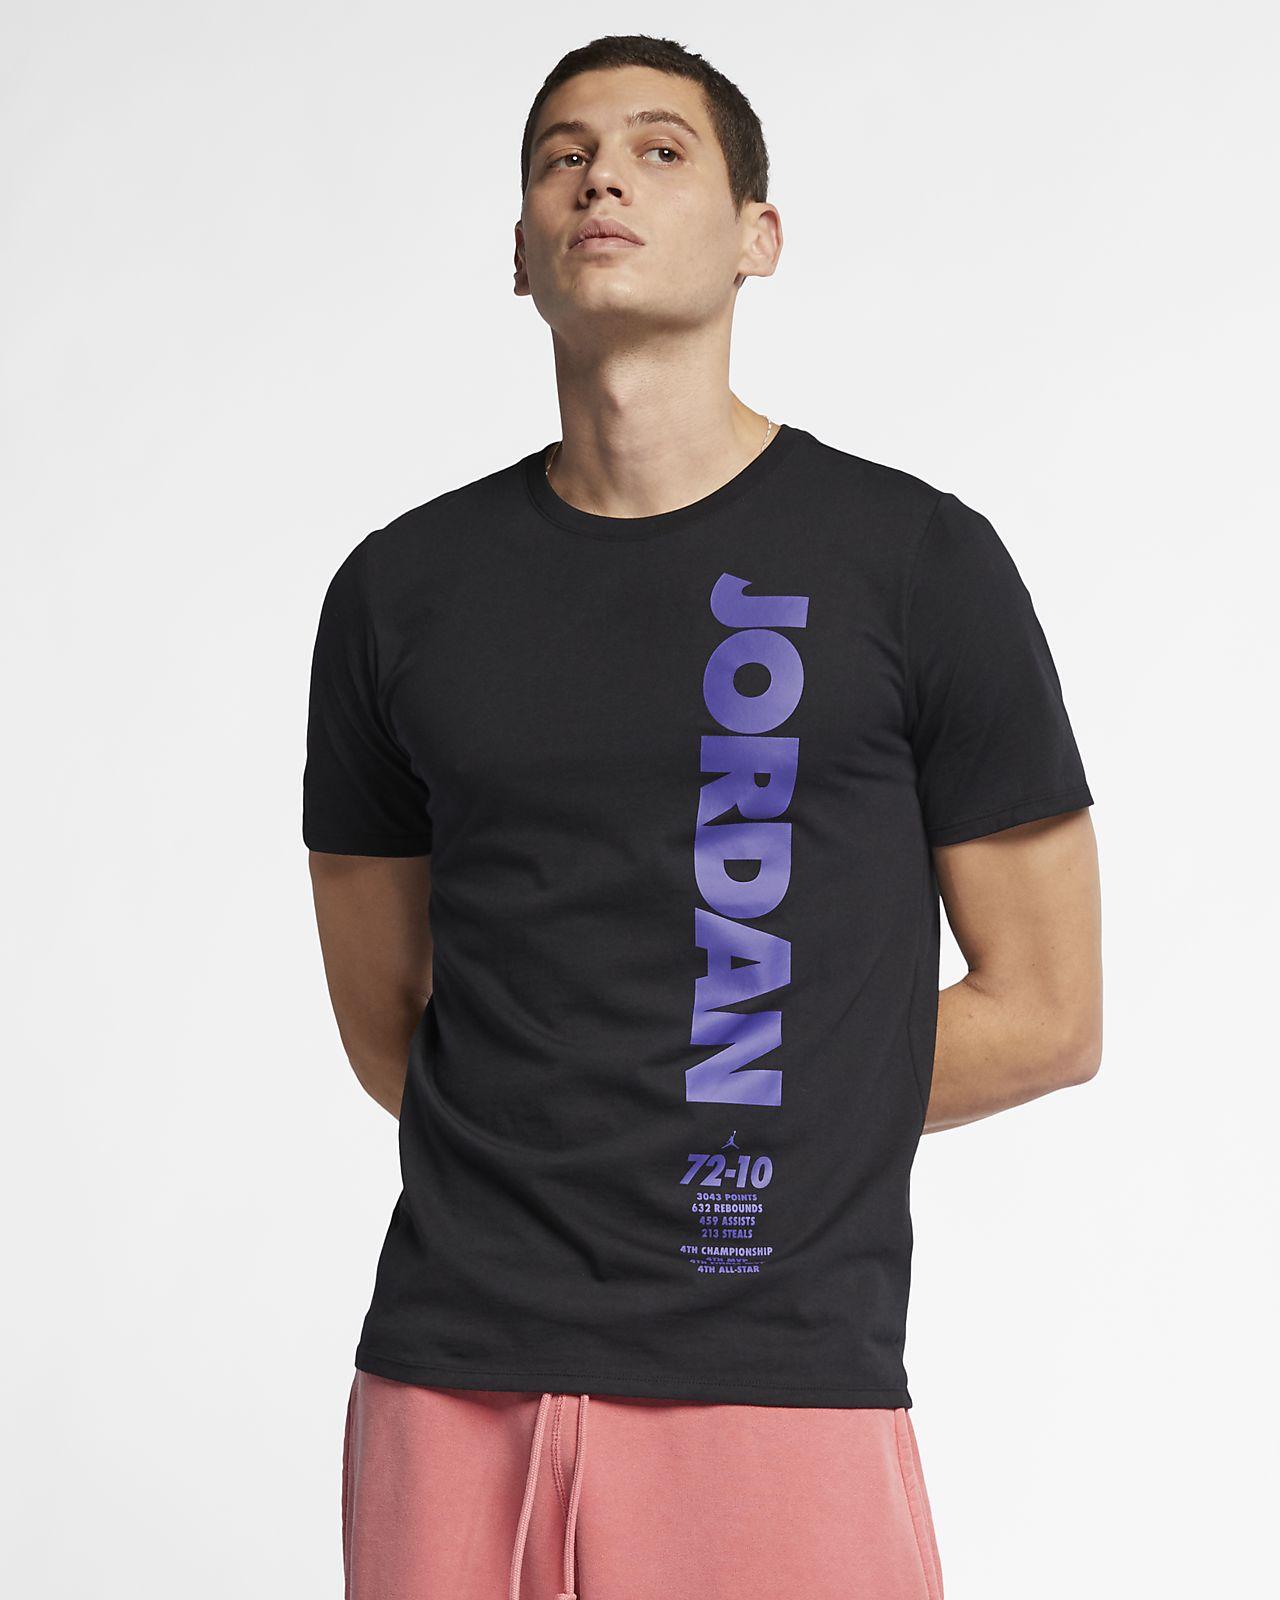 211eadea305e Мужская футболка Jordan Sportswear Legacy AJ 11. Nike.com RU